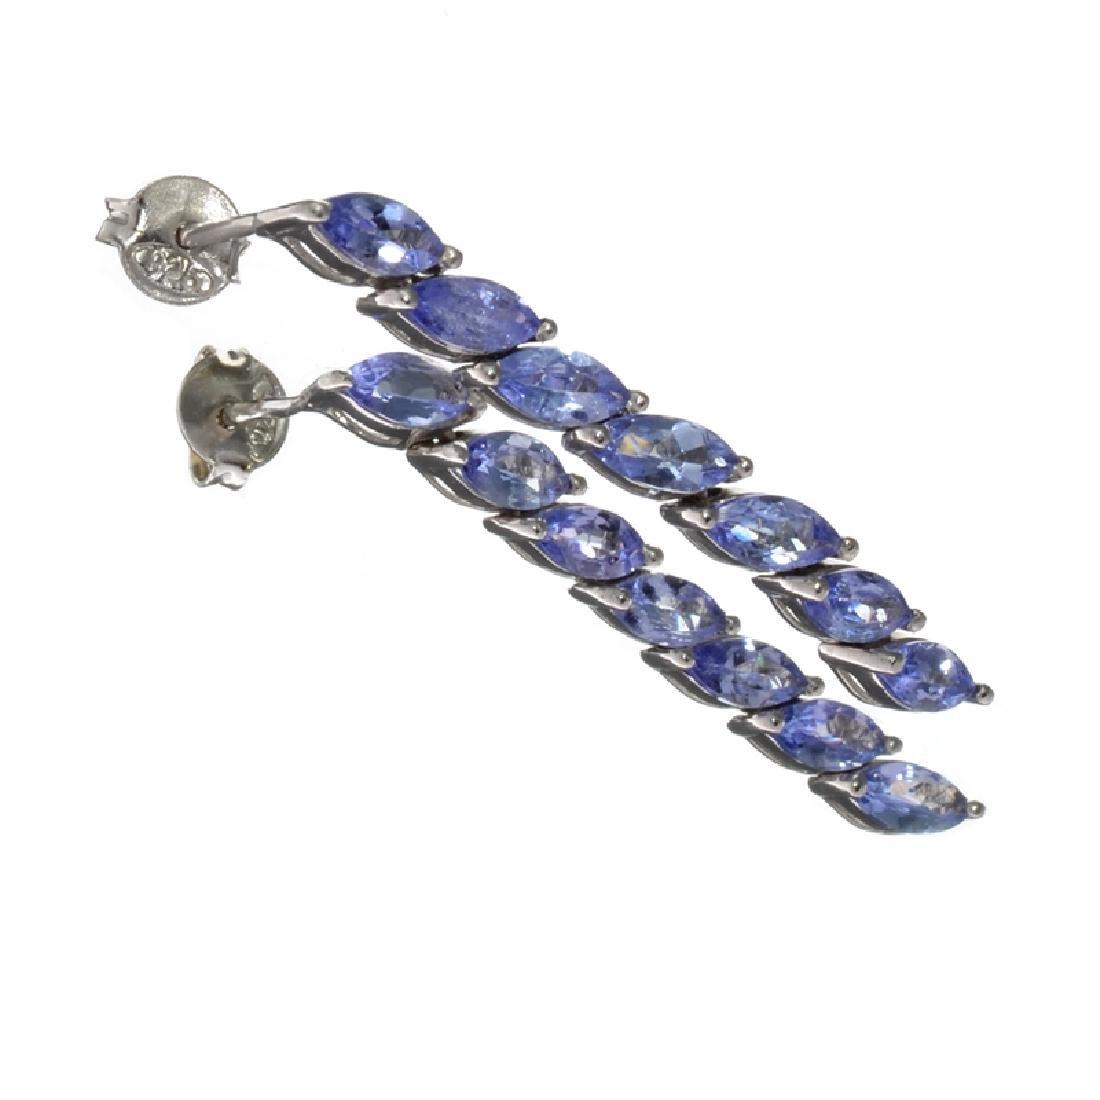 Fine Jewelry 3.62CT Marquise Cut Violet Blue Tanzanite